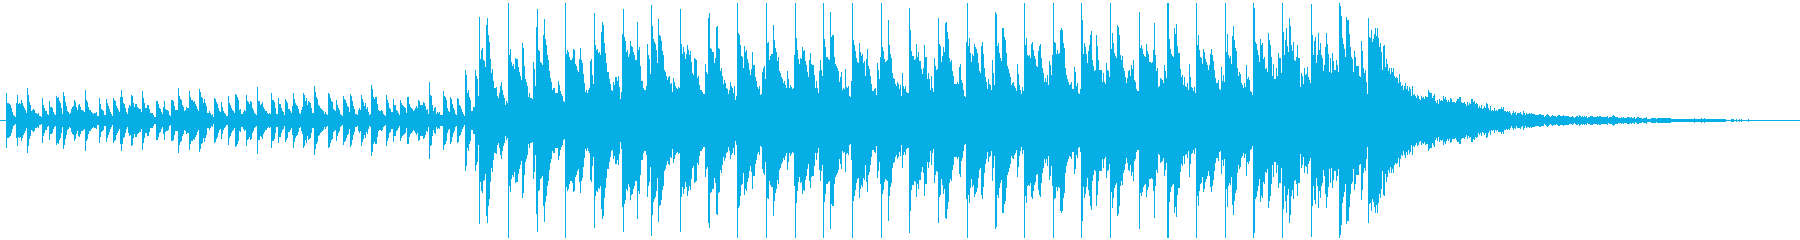 NCS風オリジナルインスト曲です。の再生済みの波形